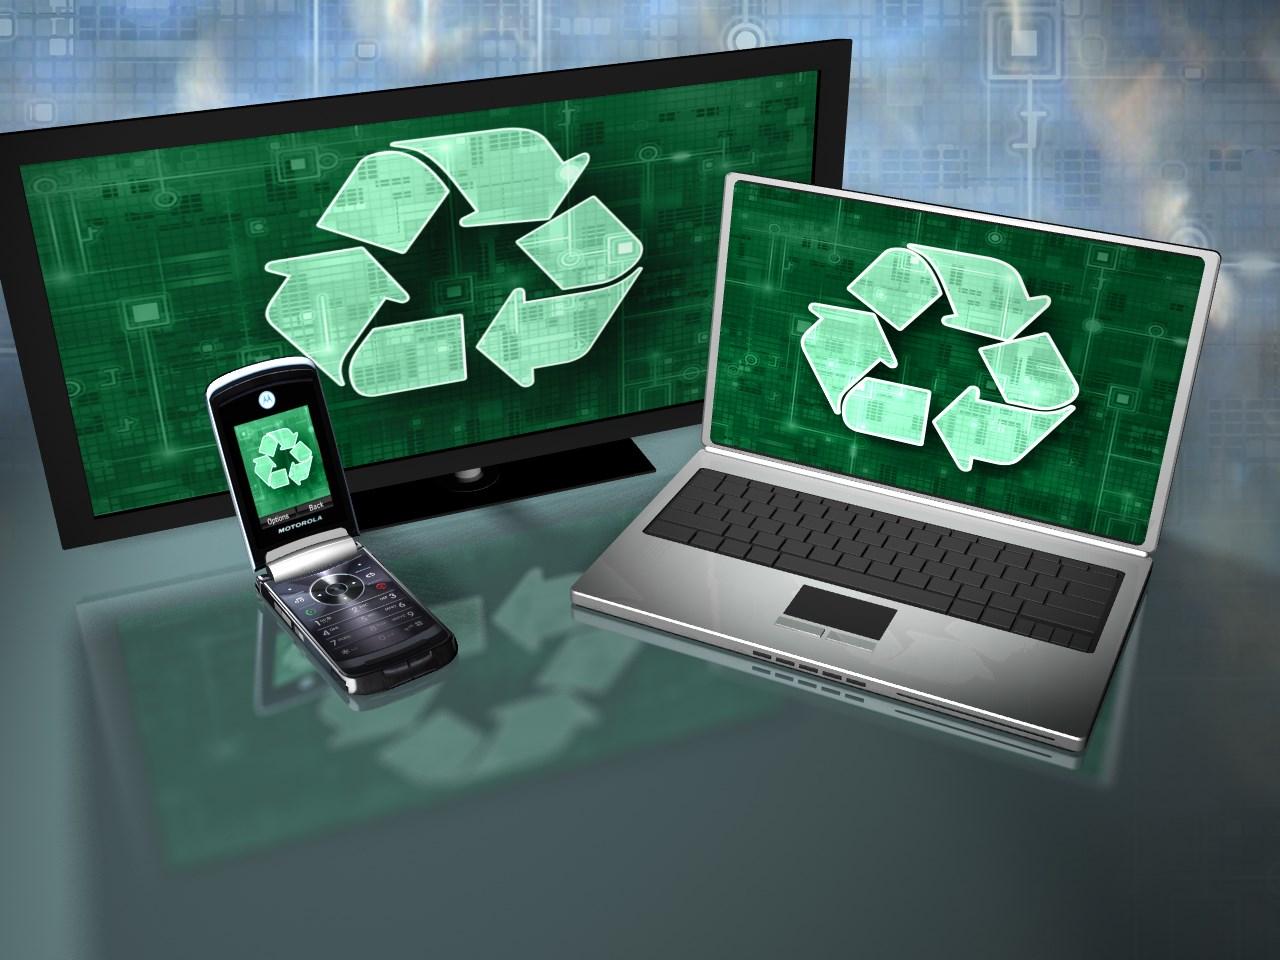 electronics recycling_1490633809741.jpg